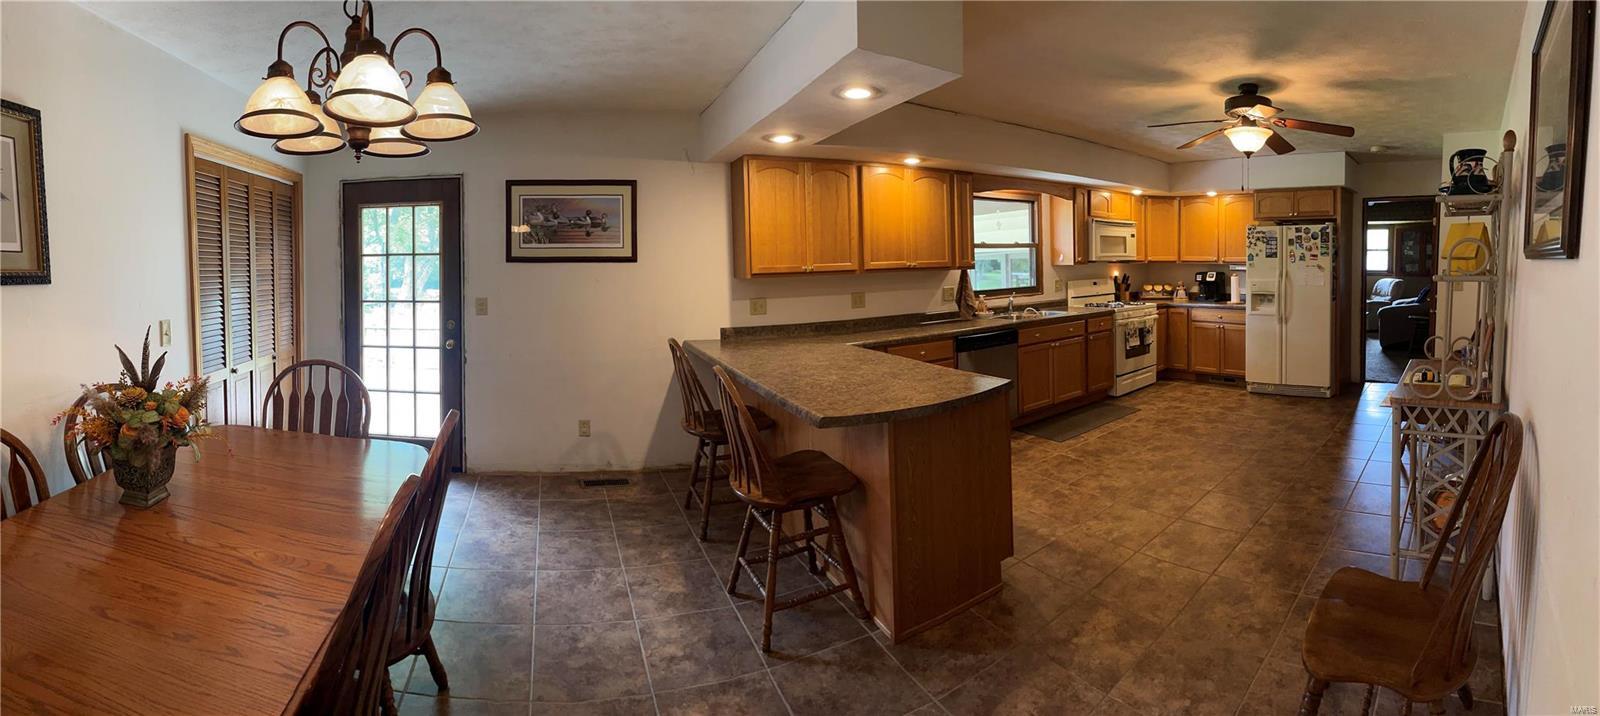 213 Lingale Avenue Property Photo 6